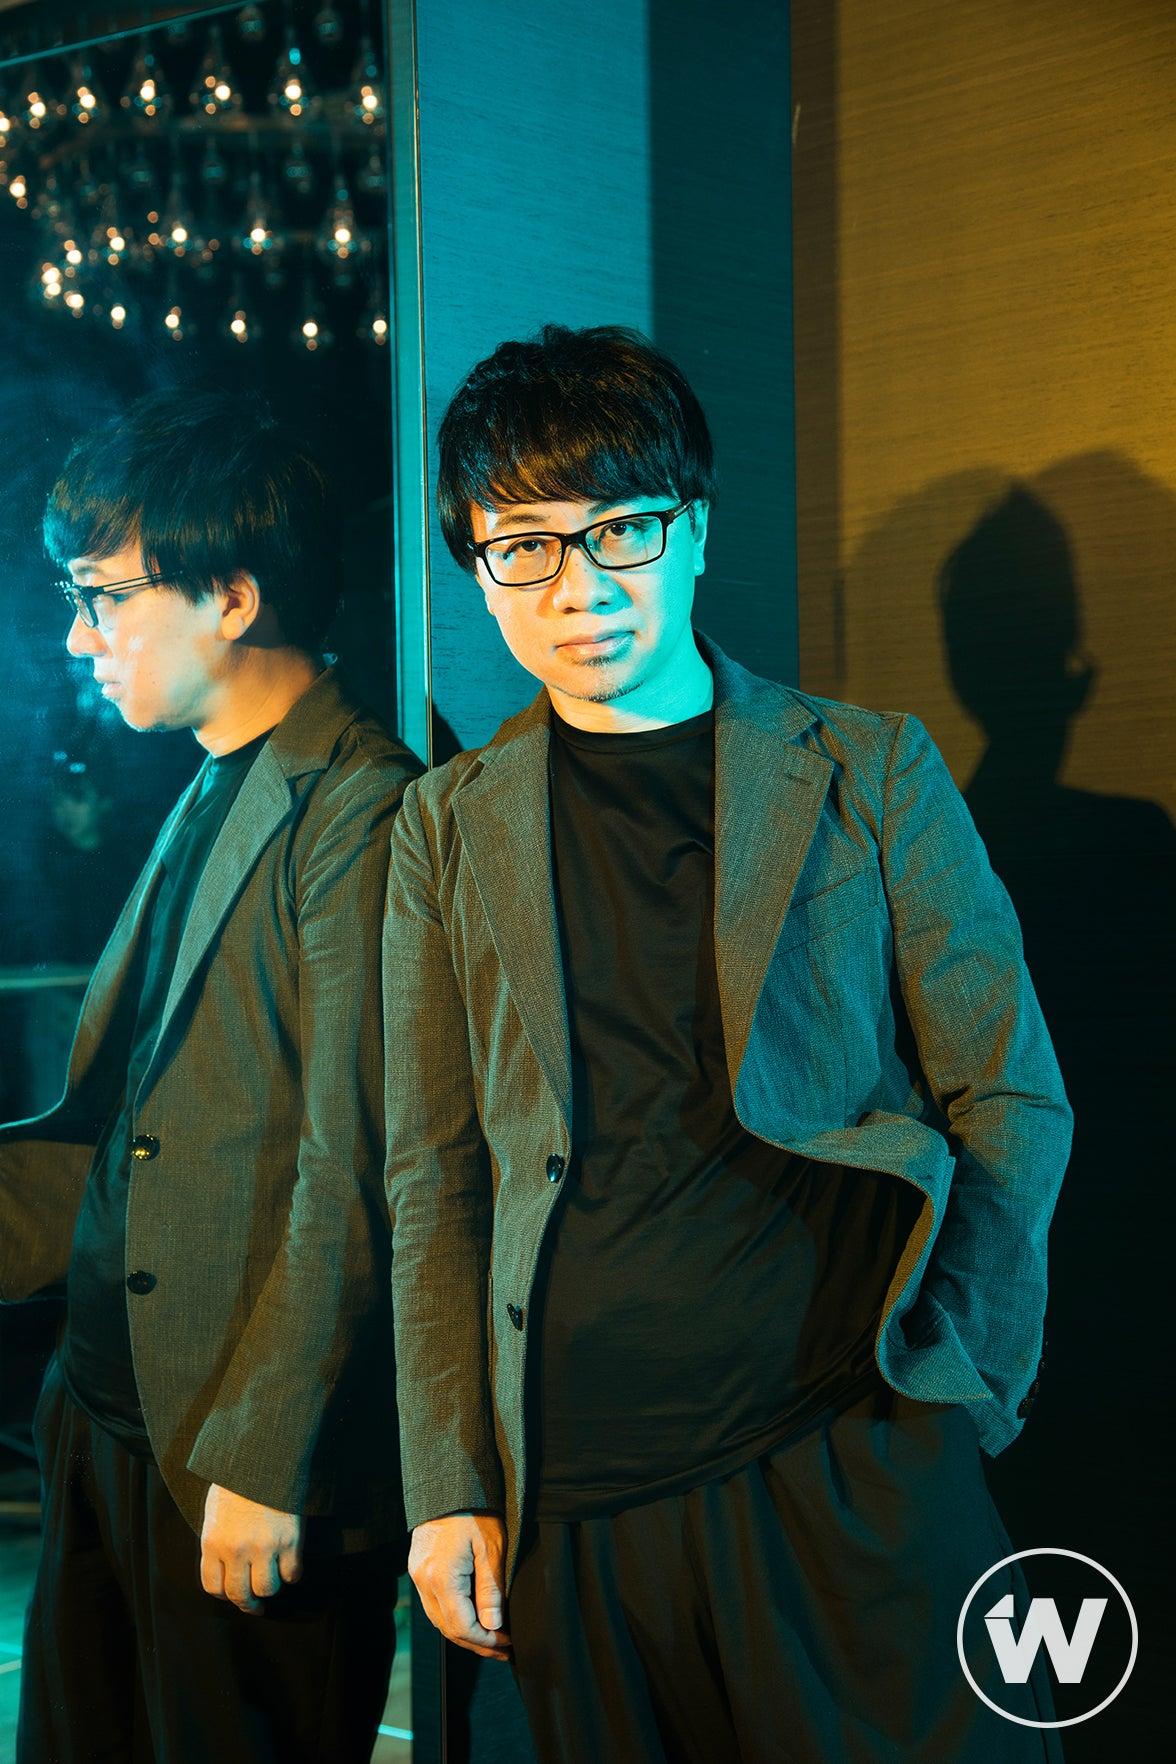 Makoto Shinkai, Weathering With You